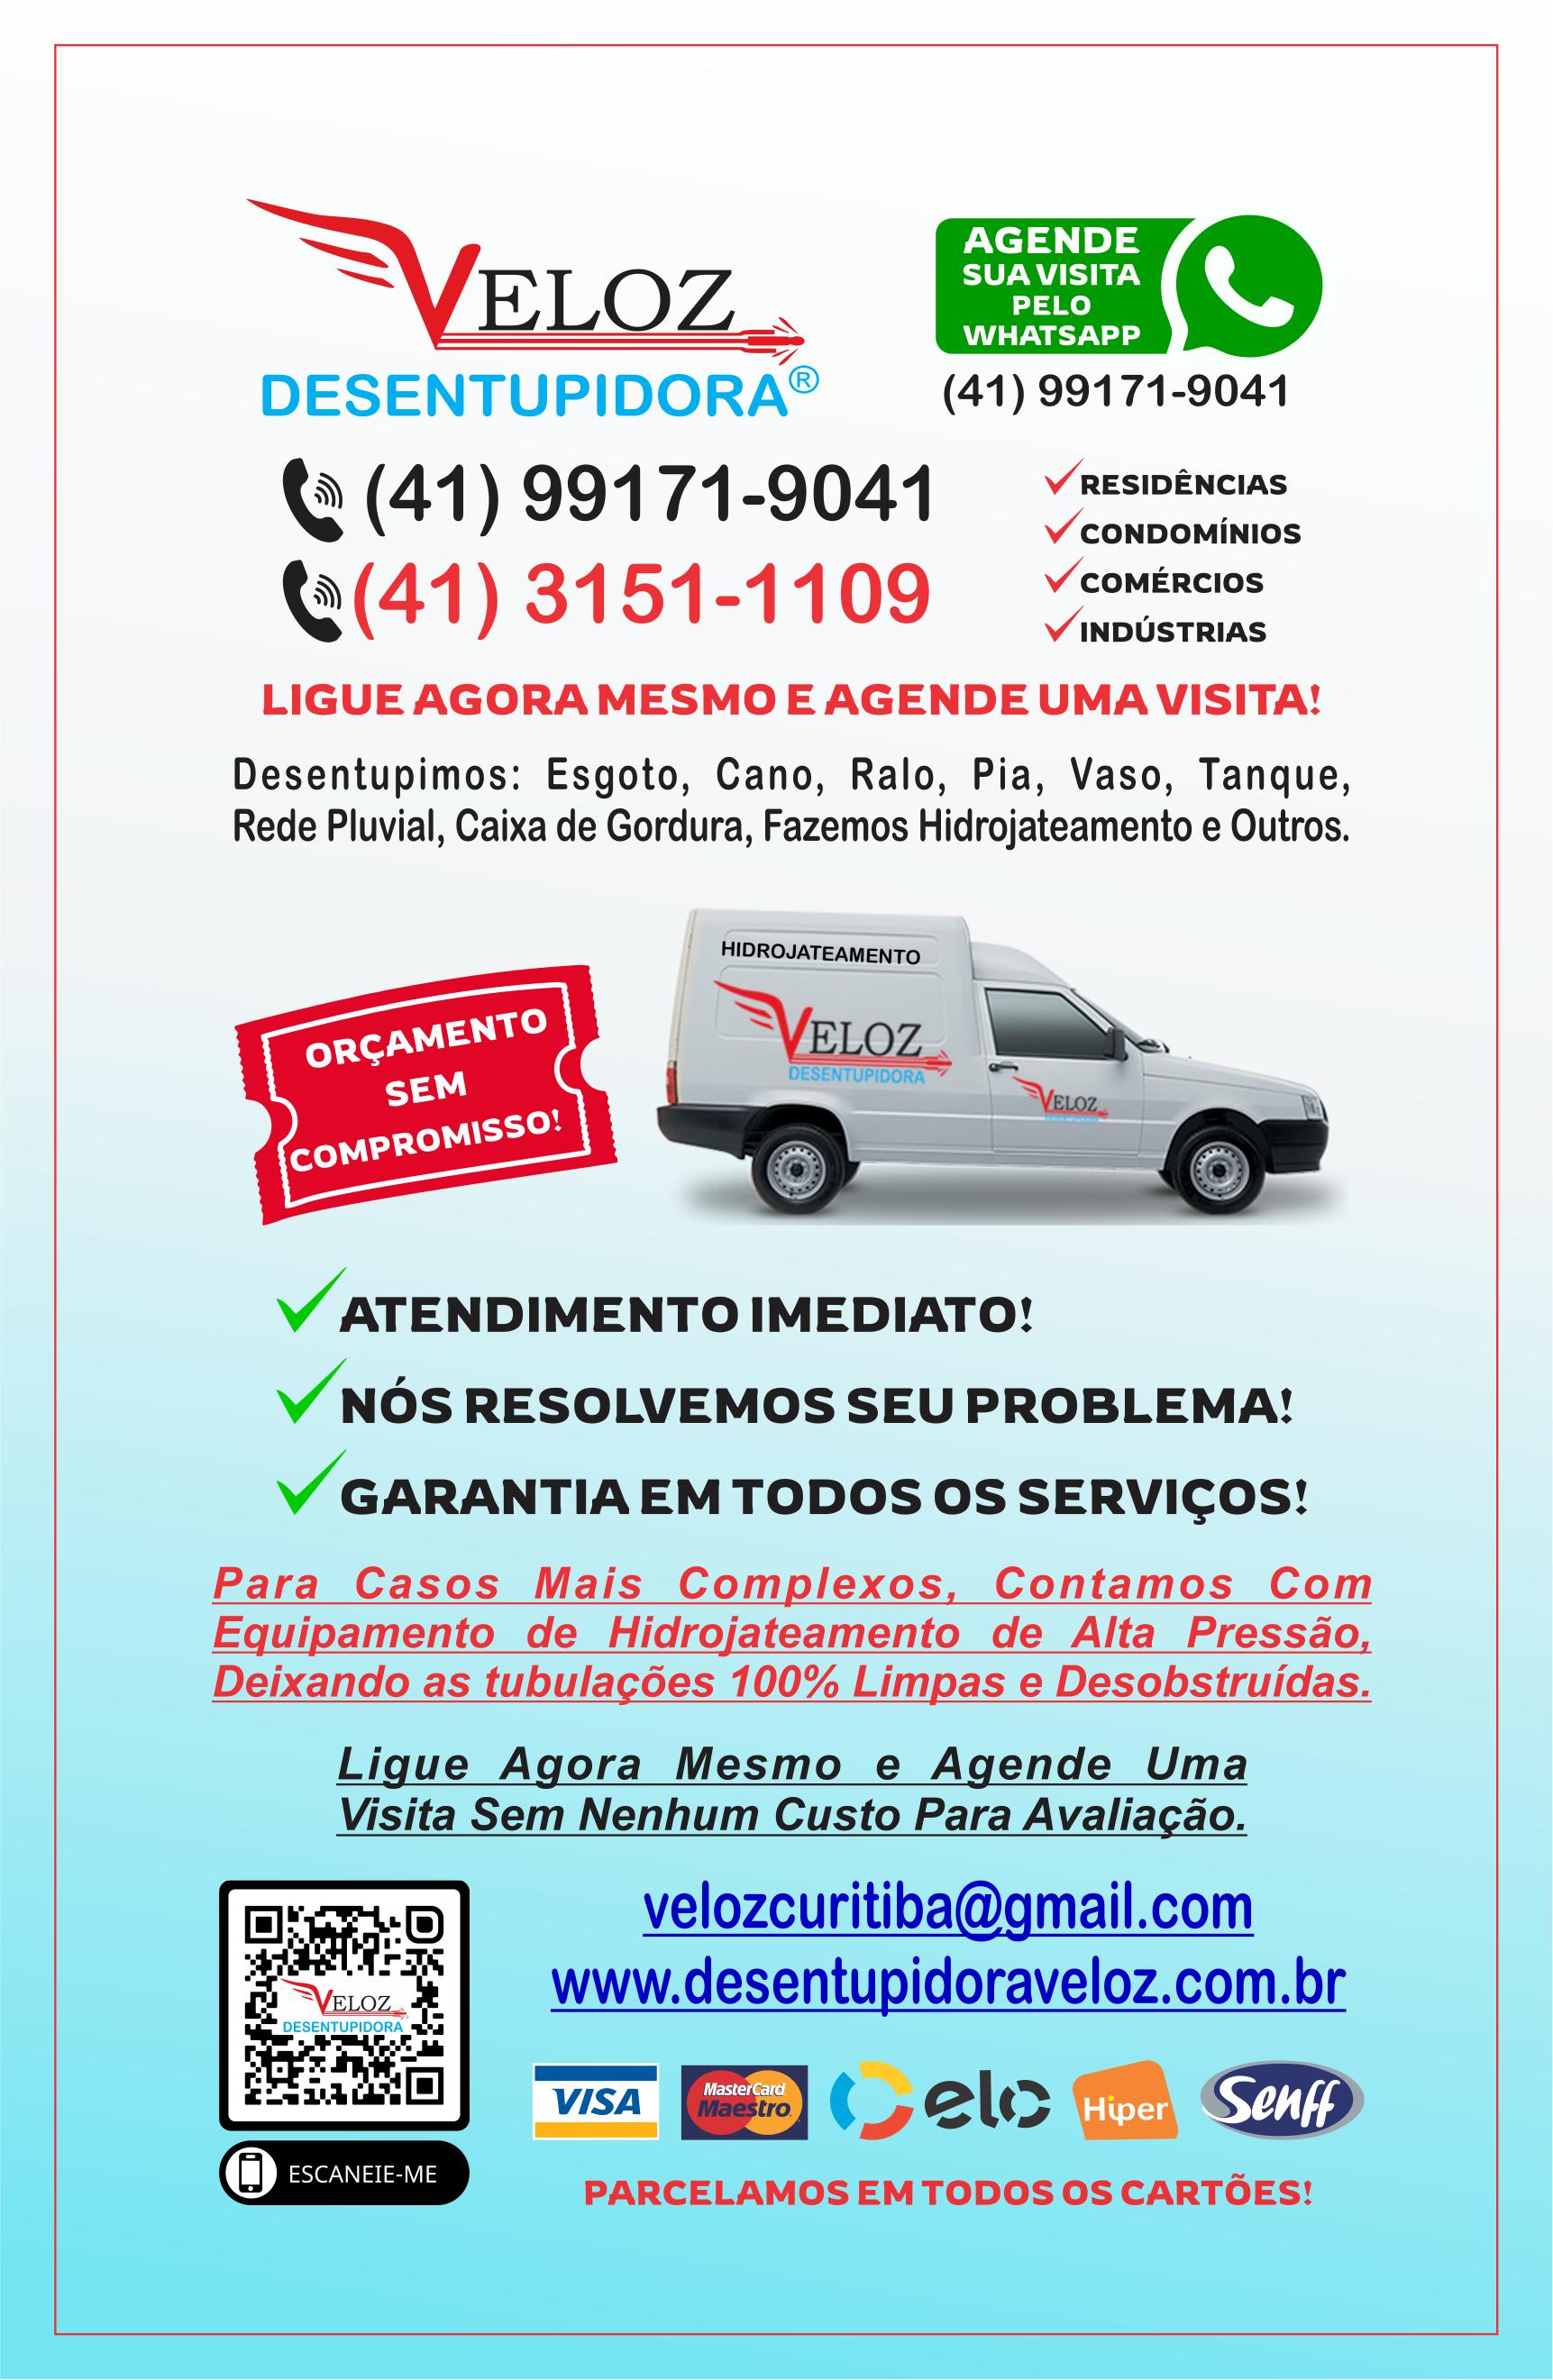 Desentupidora Veloz       Fones: (41)3019-2426 / (41) 98532-9727